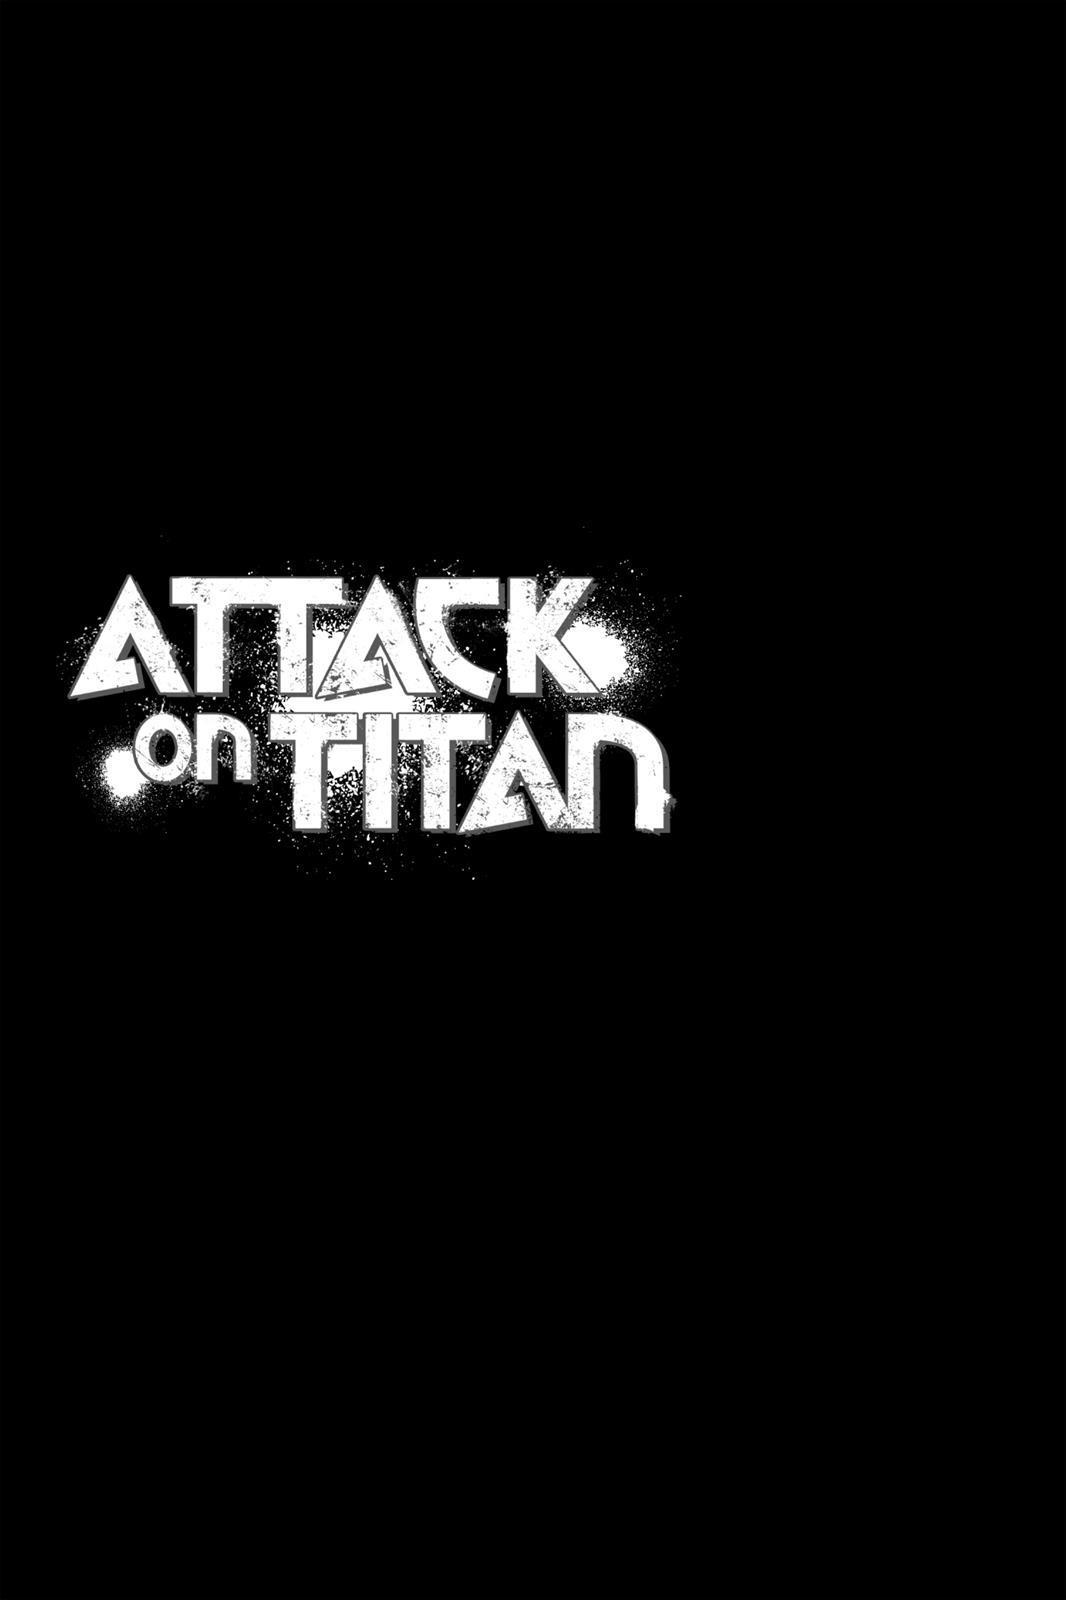 Attack On Titan, Episode 61 image 046